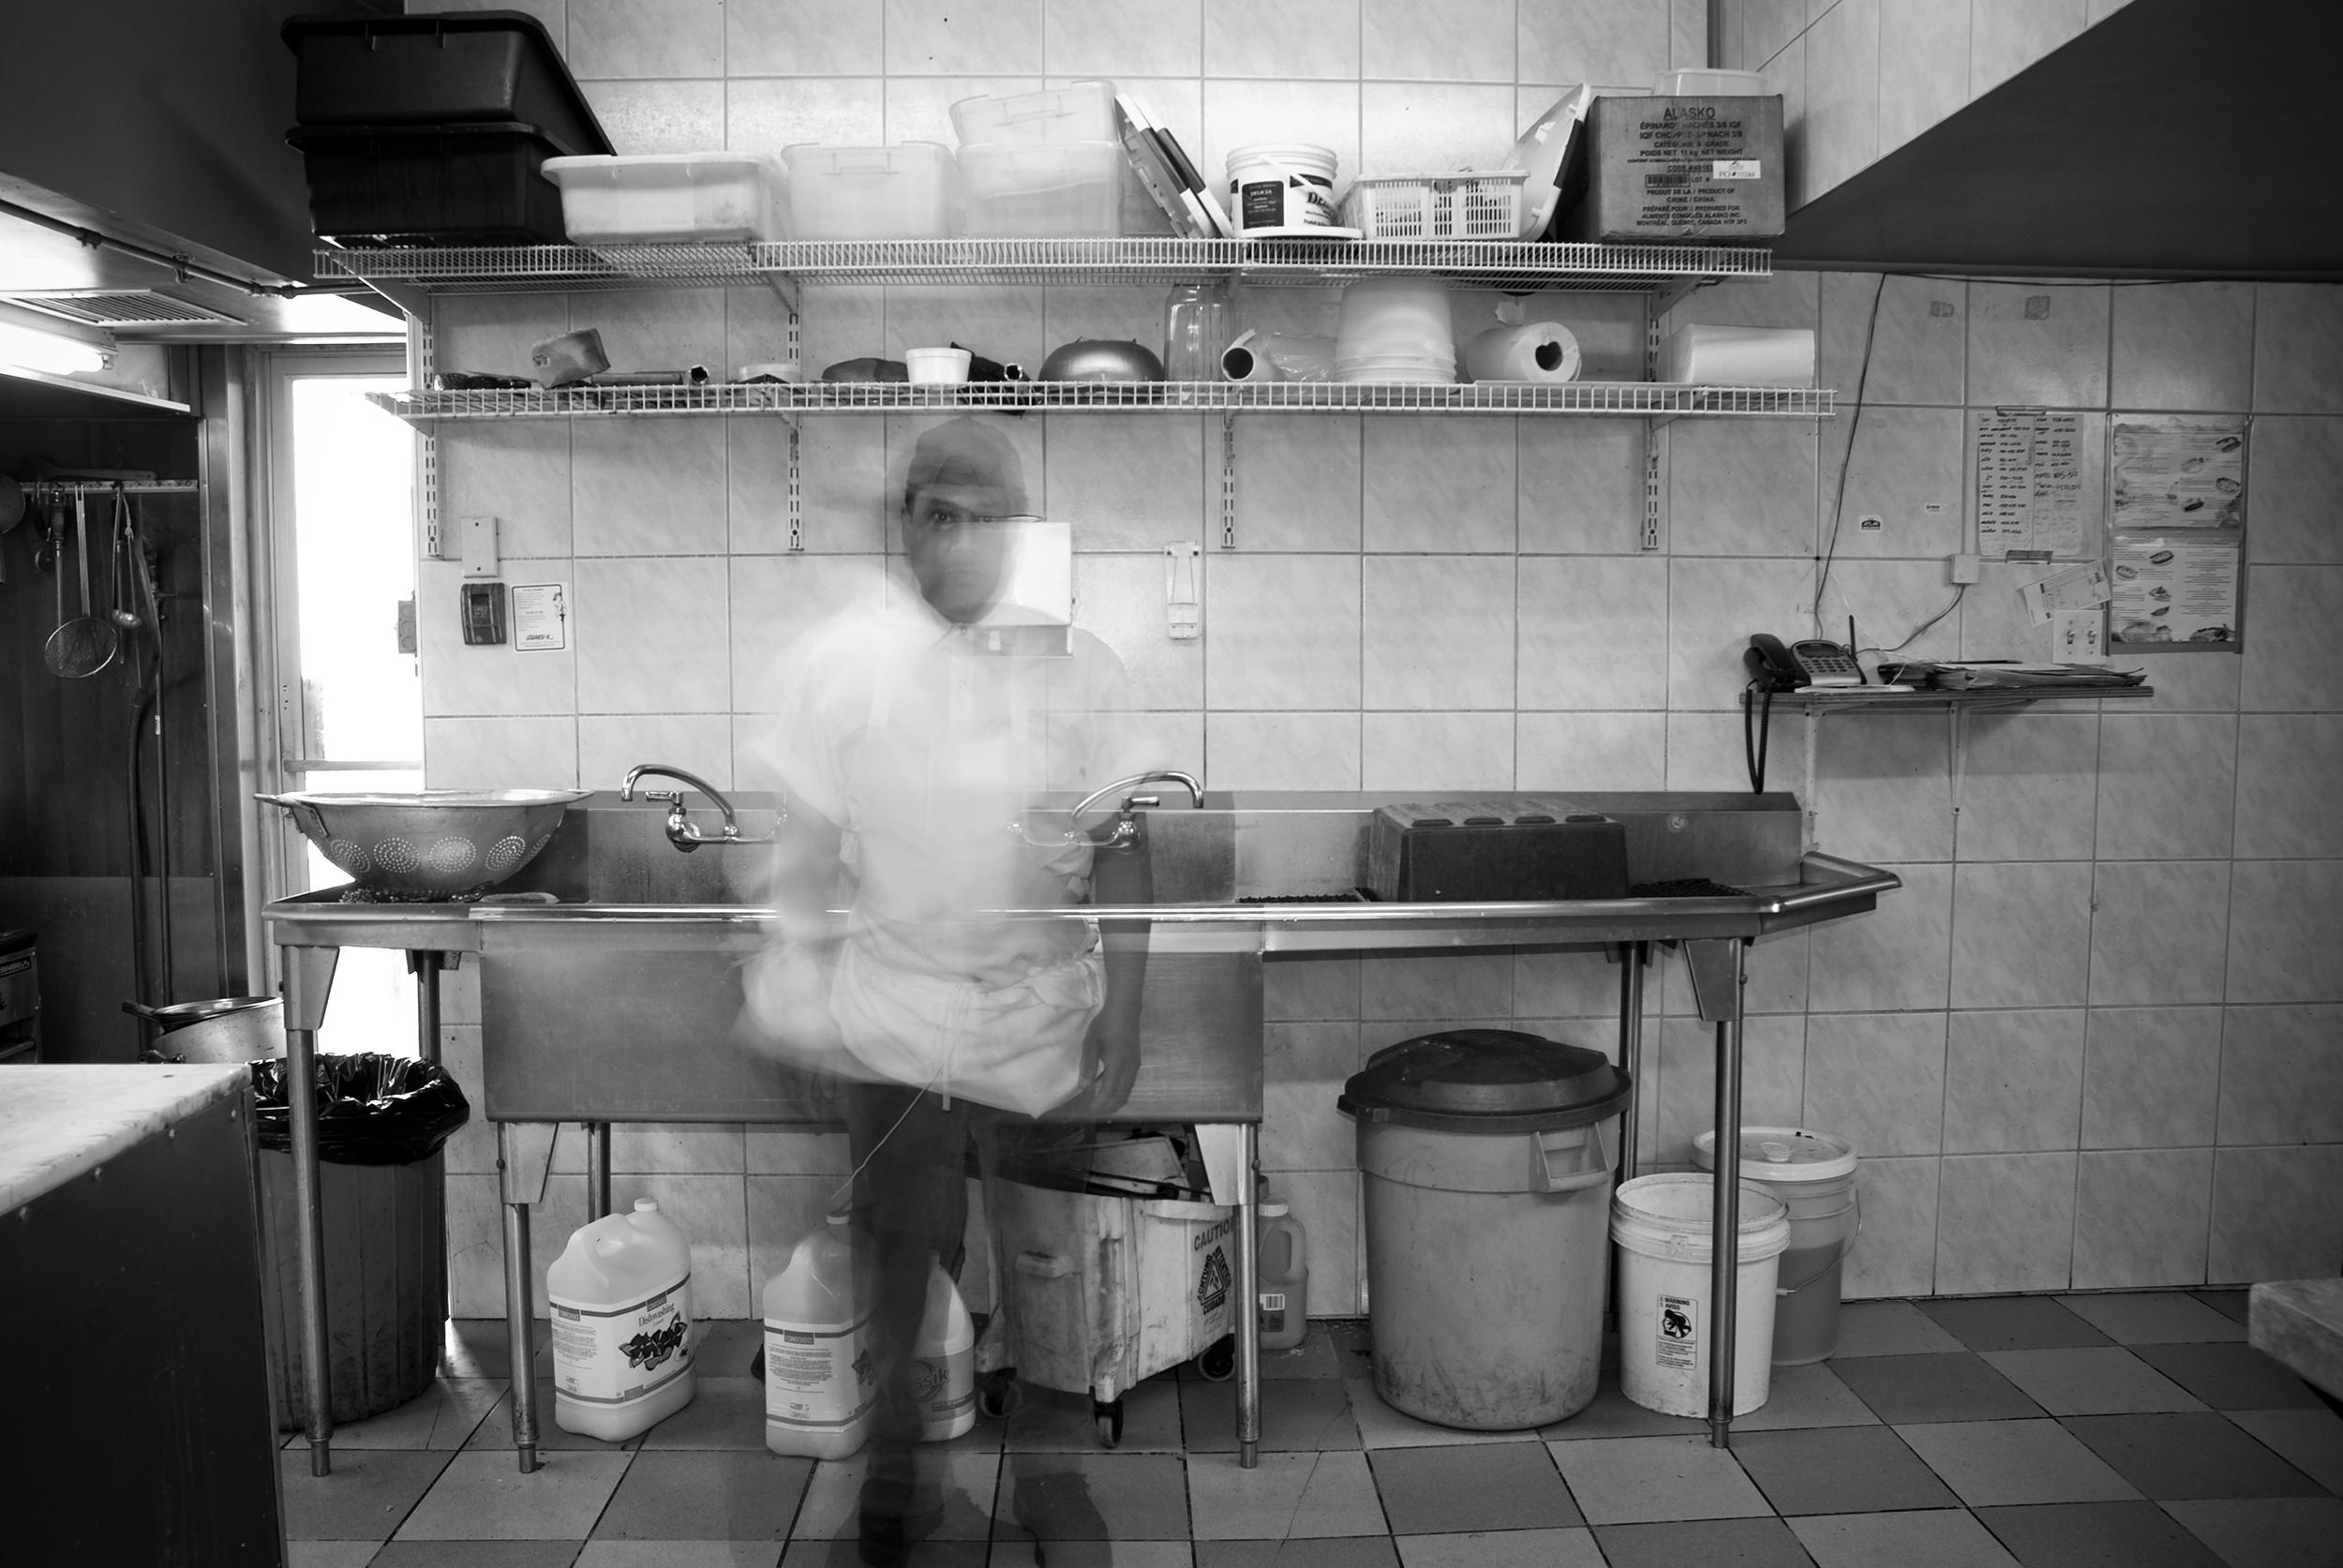 man-by-the-dishwashing-station.jpg